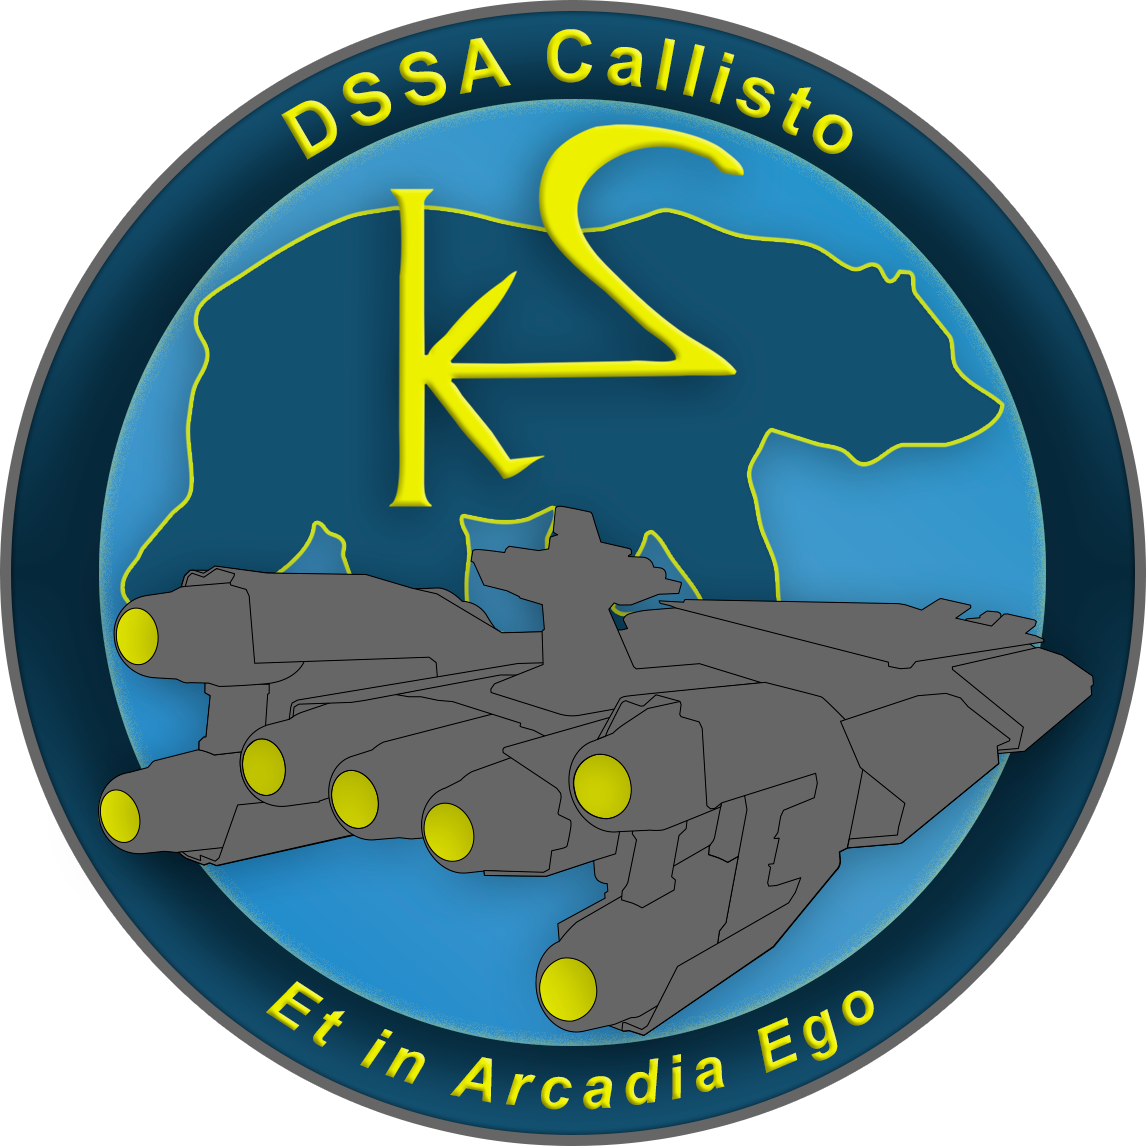 DSSA-Callisto-Logo.png